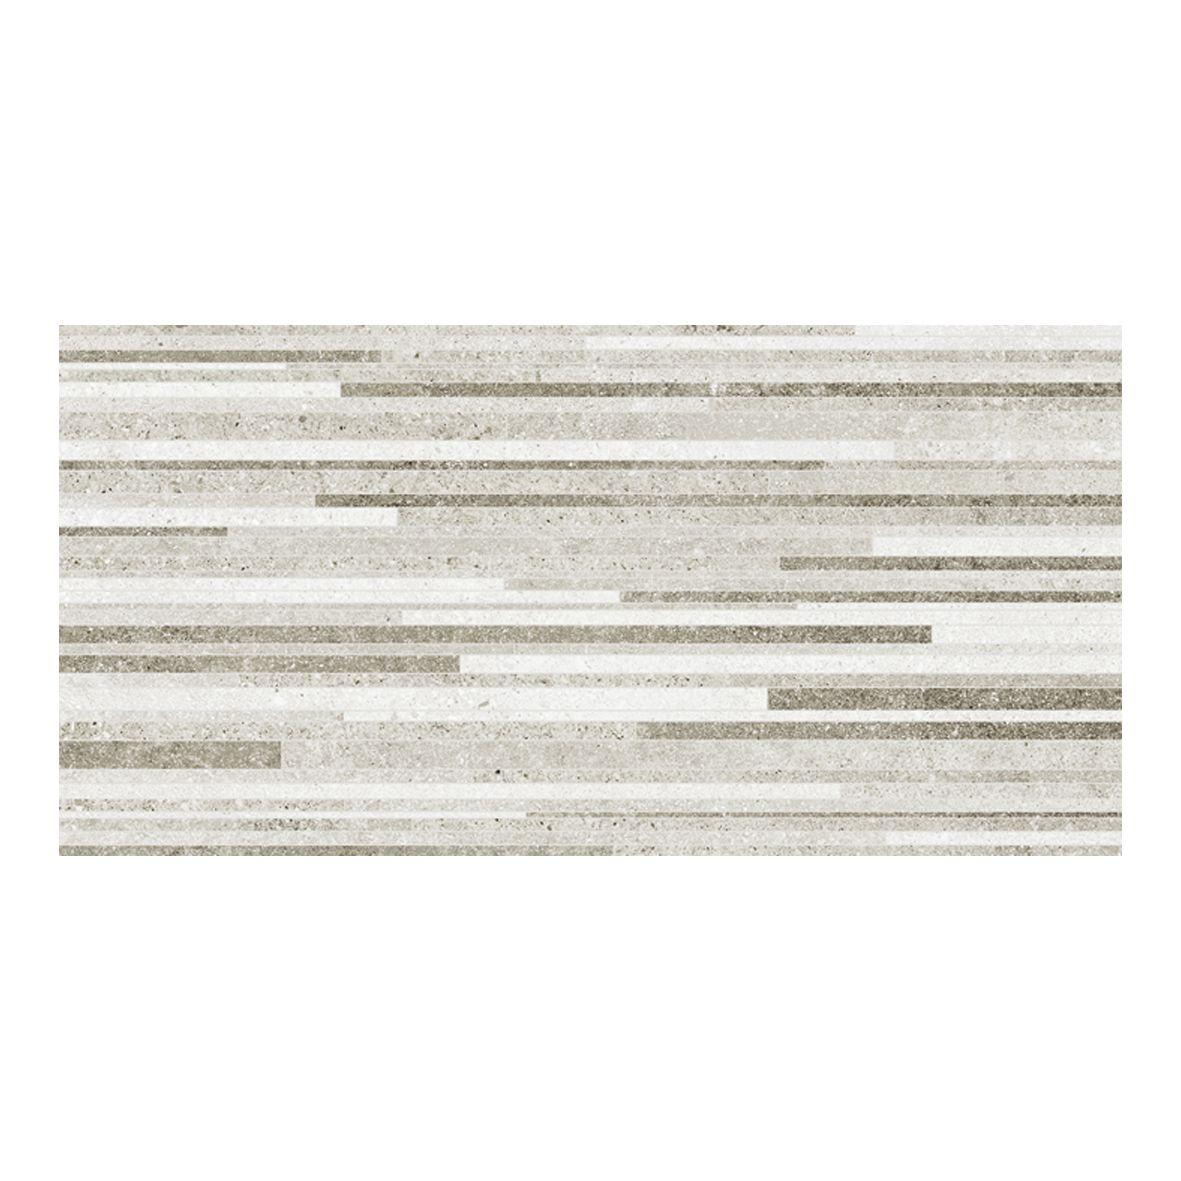 Mapisa Household Grey Tile - 600x300mm - Bathroom Wall, Floor Tiles ...